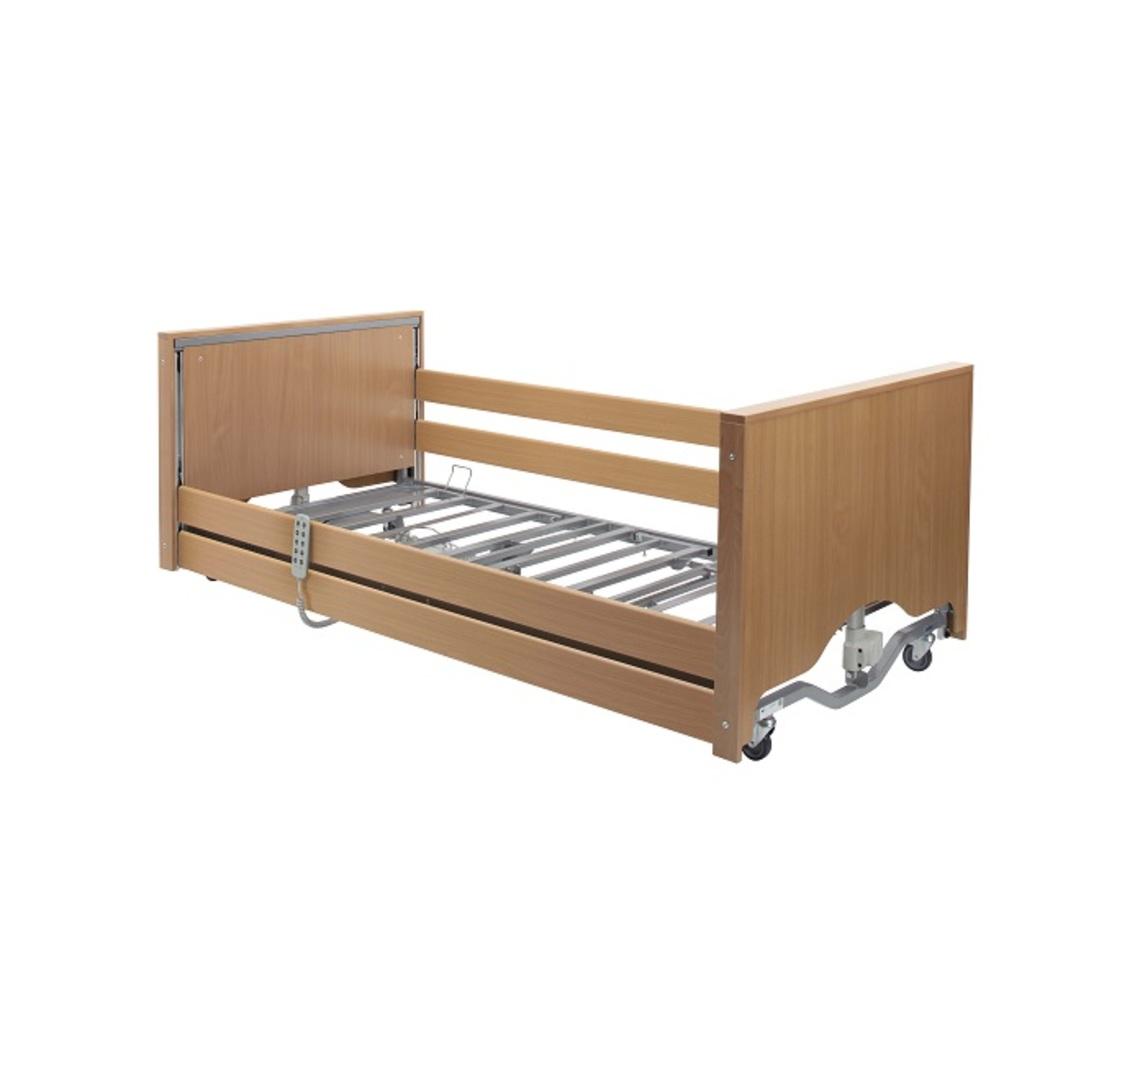 Casa Elite Low Bed with Wooden Side Rail Kit | Medical Supermarket